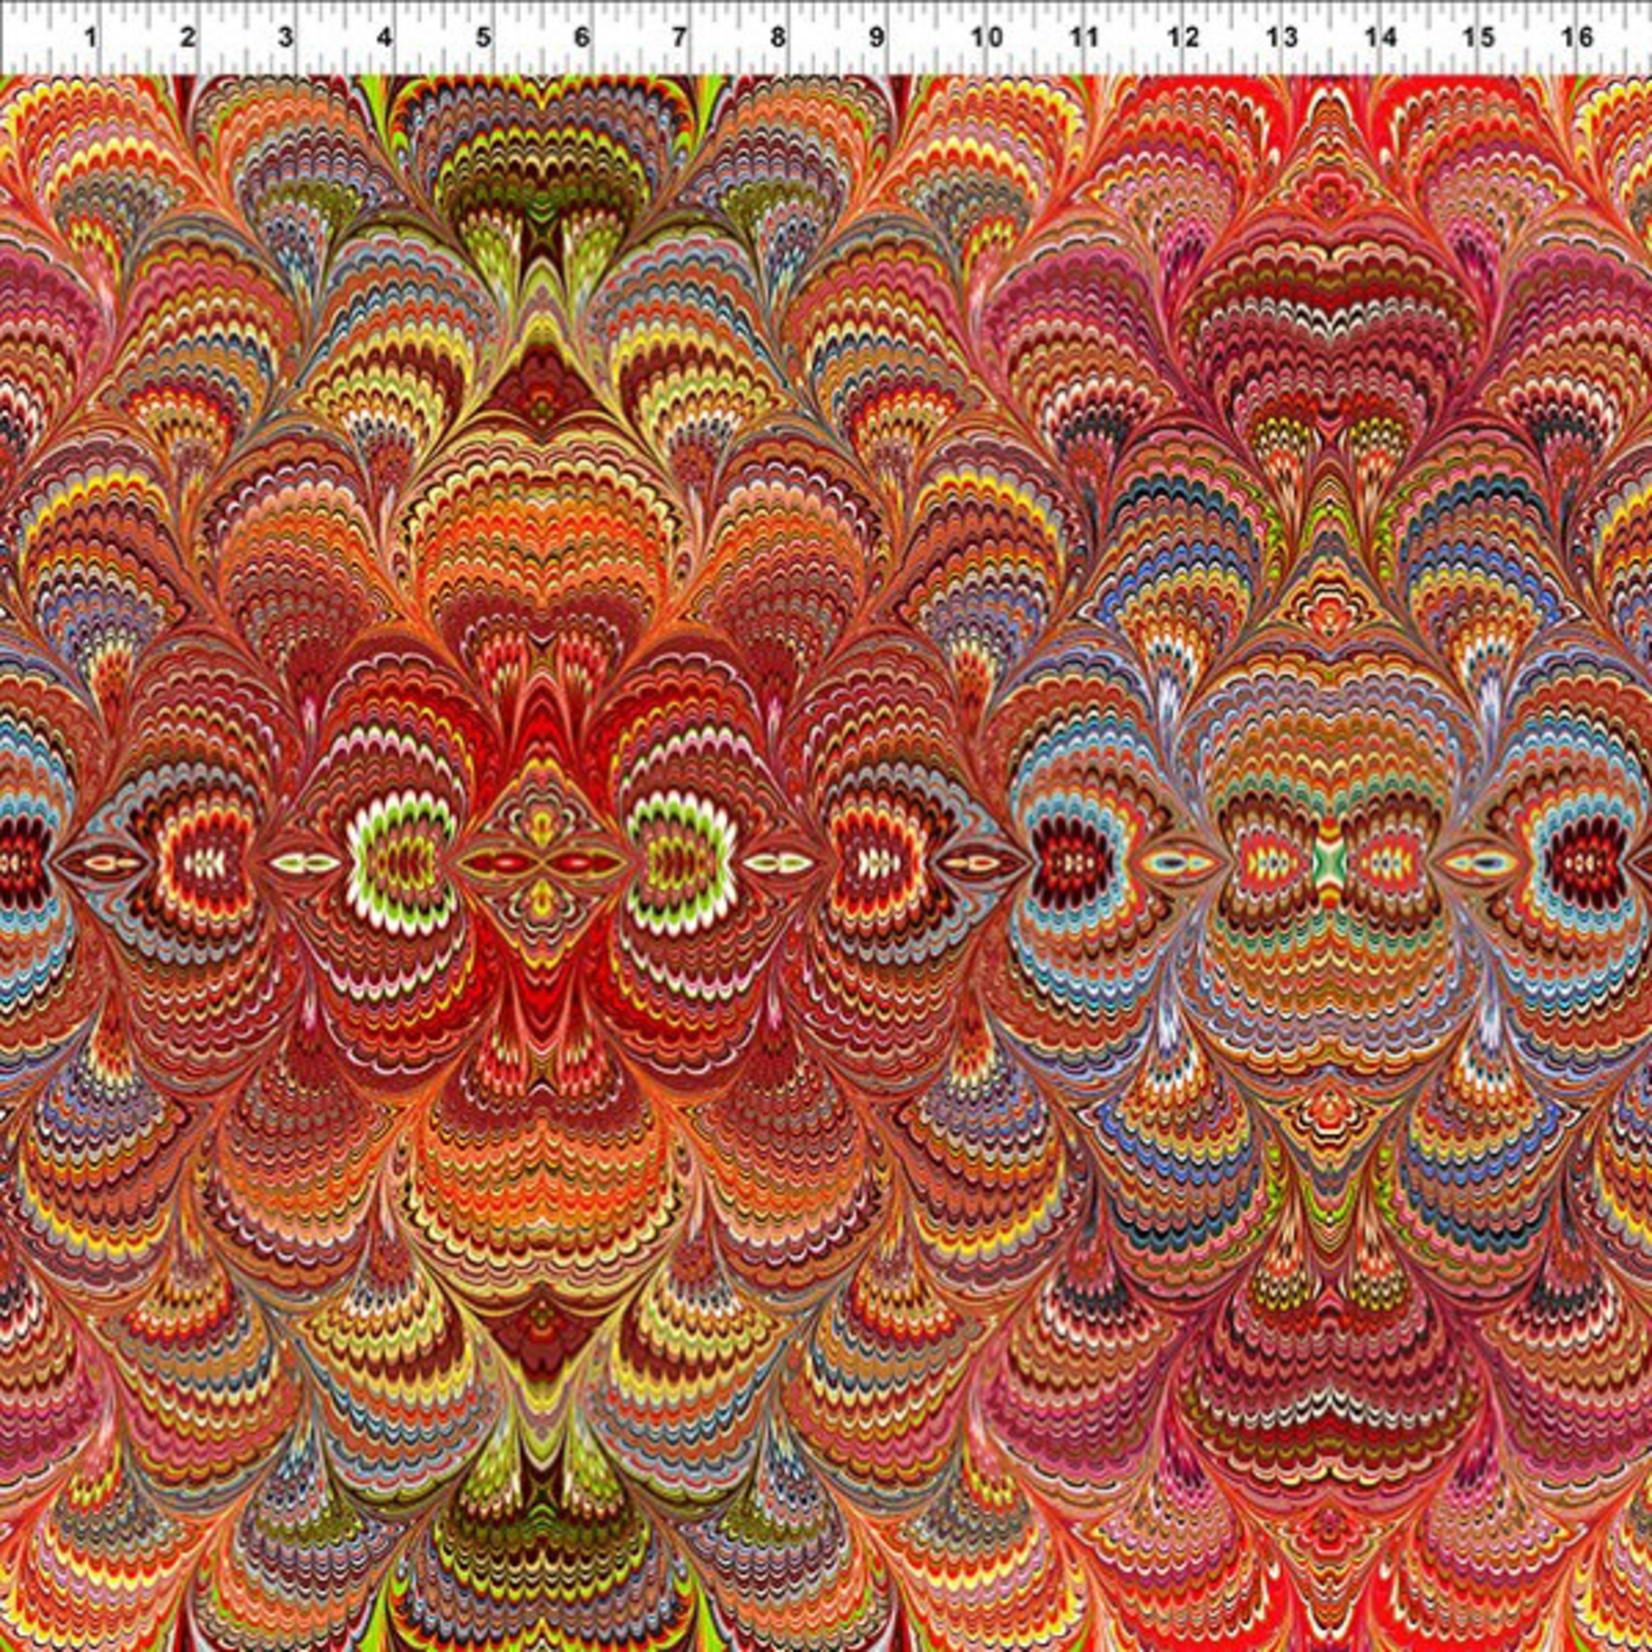 In The Beginning Marble Essence - Siena - Multi